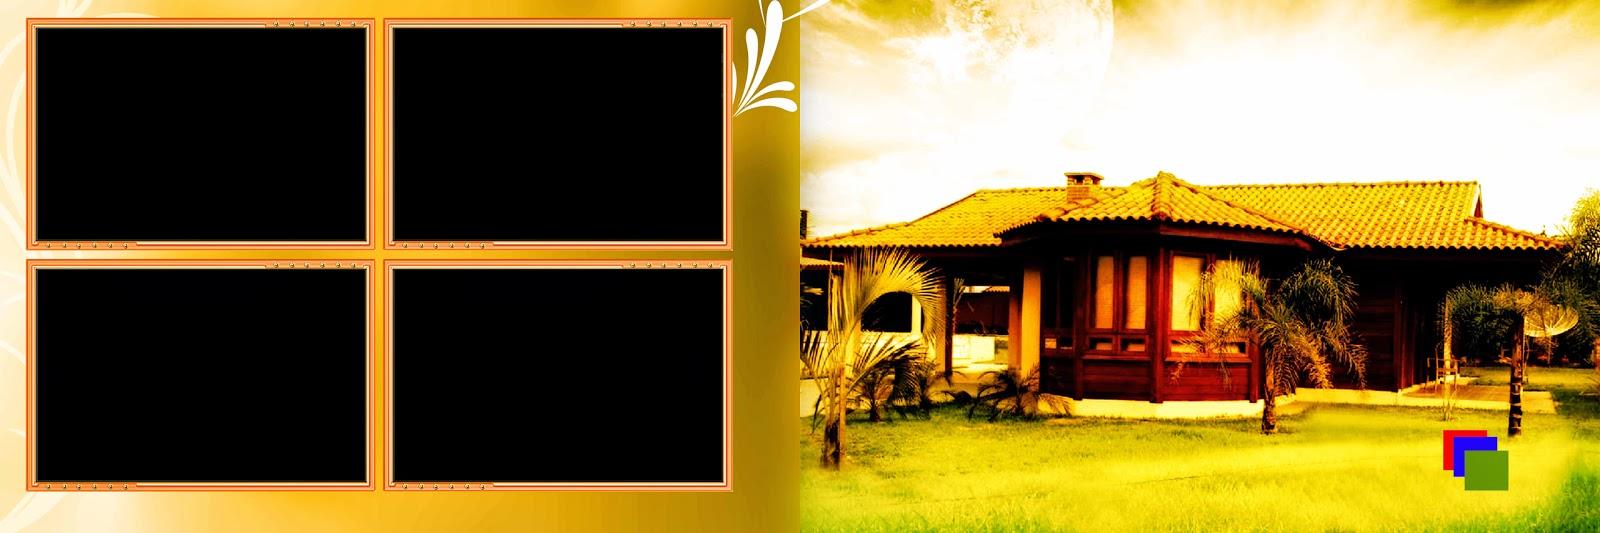 new 12x36 karishma album backgrounds and frames photos frames